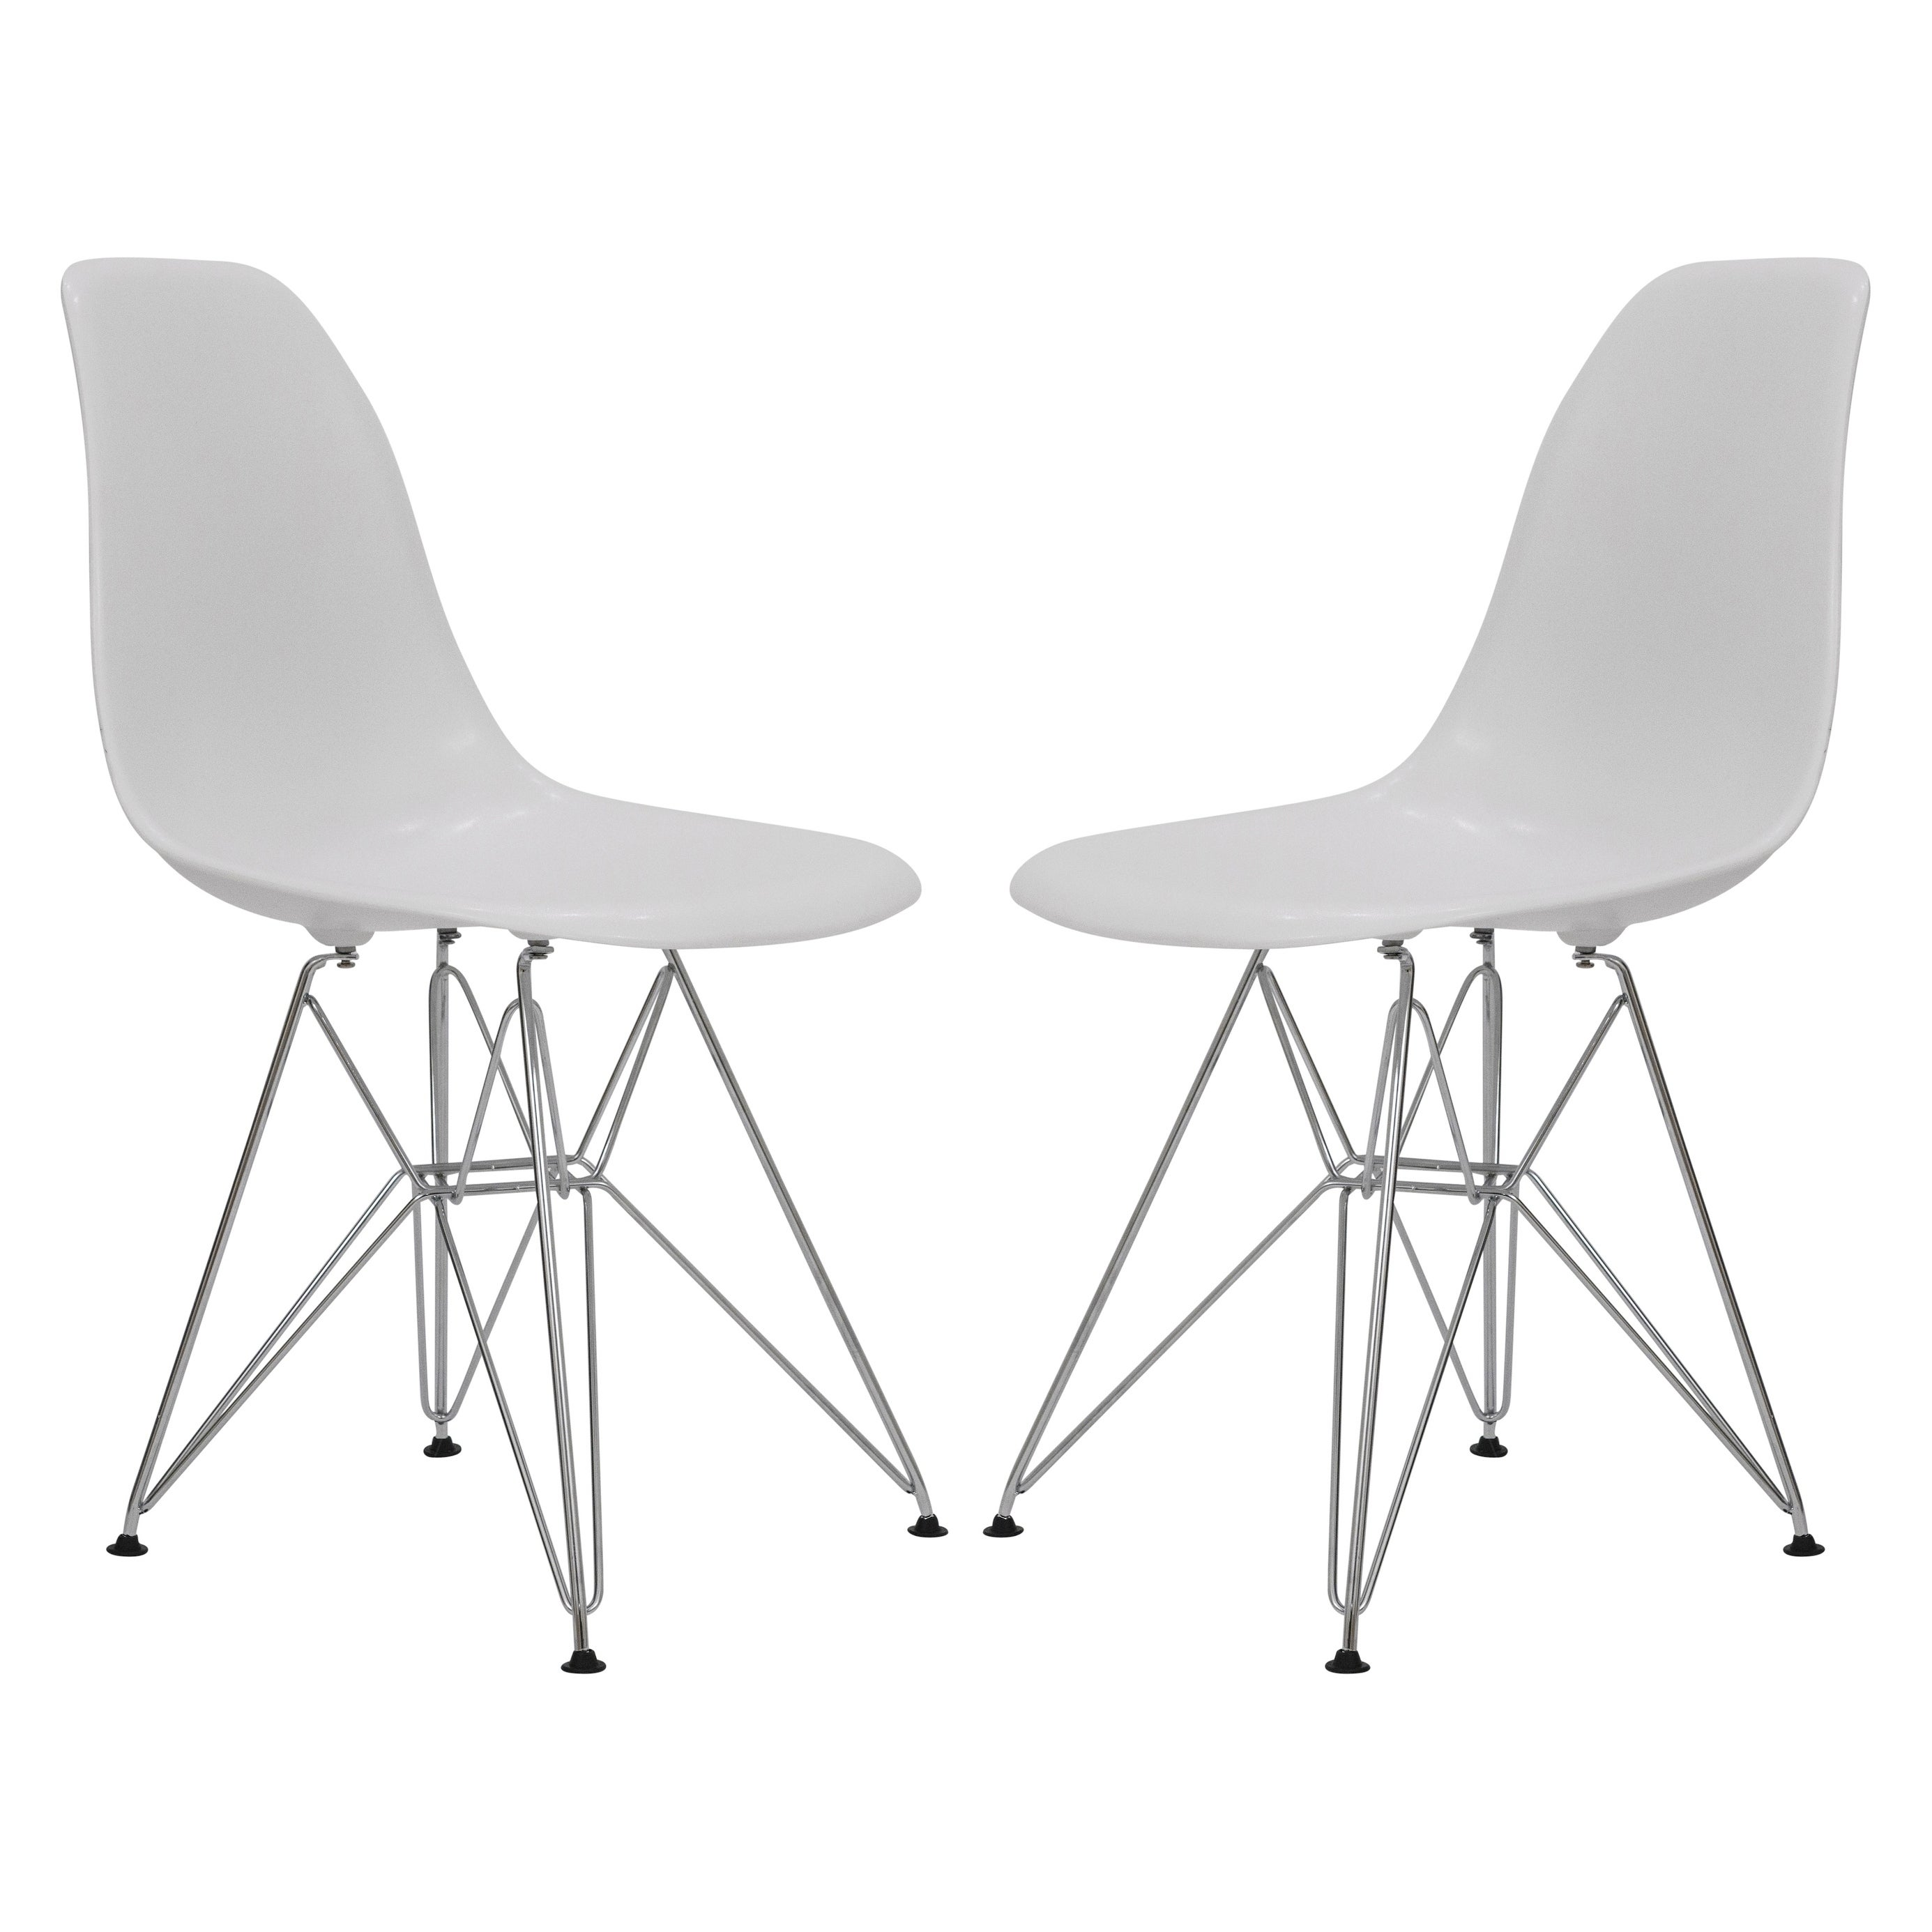 Marvelous Leisuremod Cresco White Eiffel Chrome Base Dining Side Chair Set Of 2 Beatyapartments Chair Design Images Beatyapartmentscom